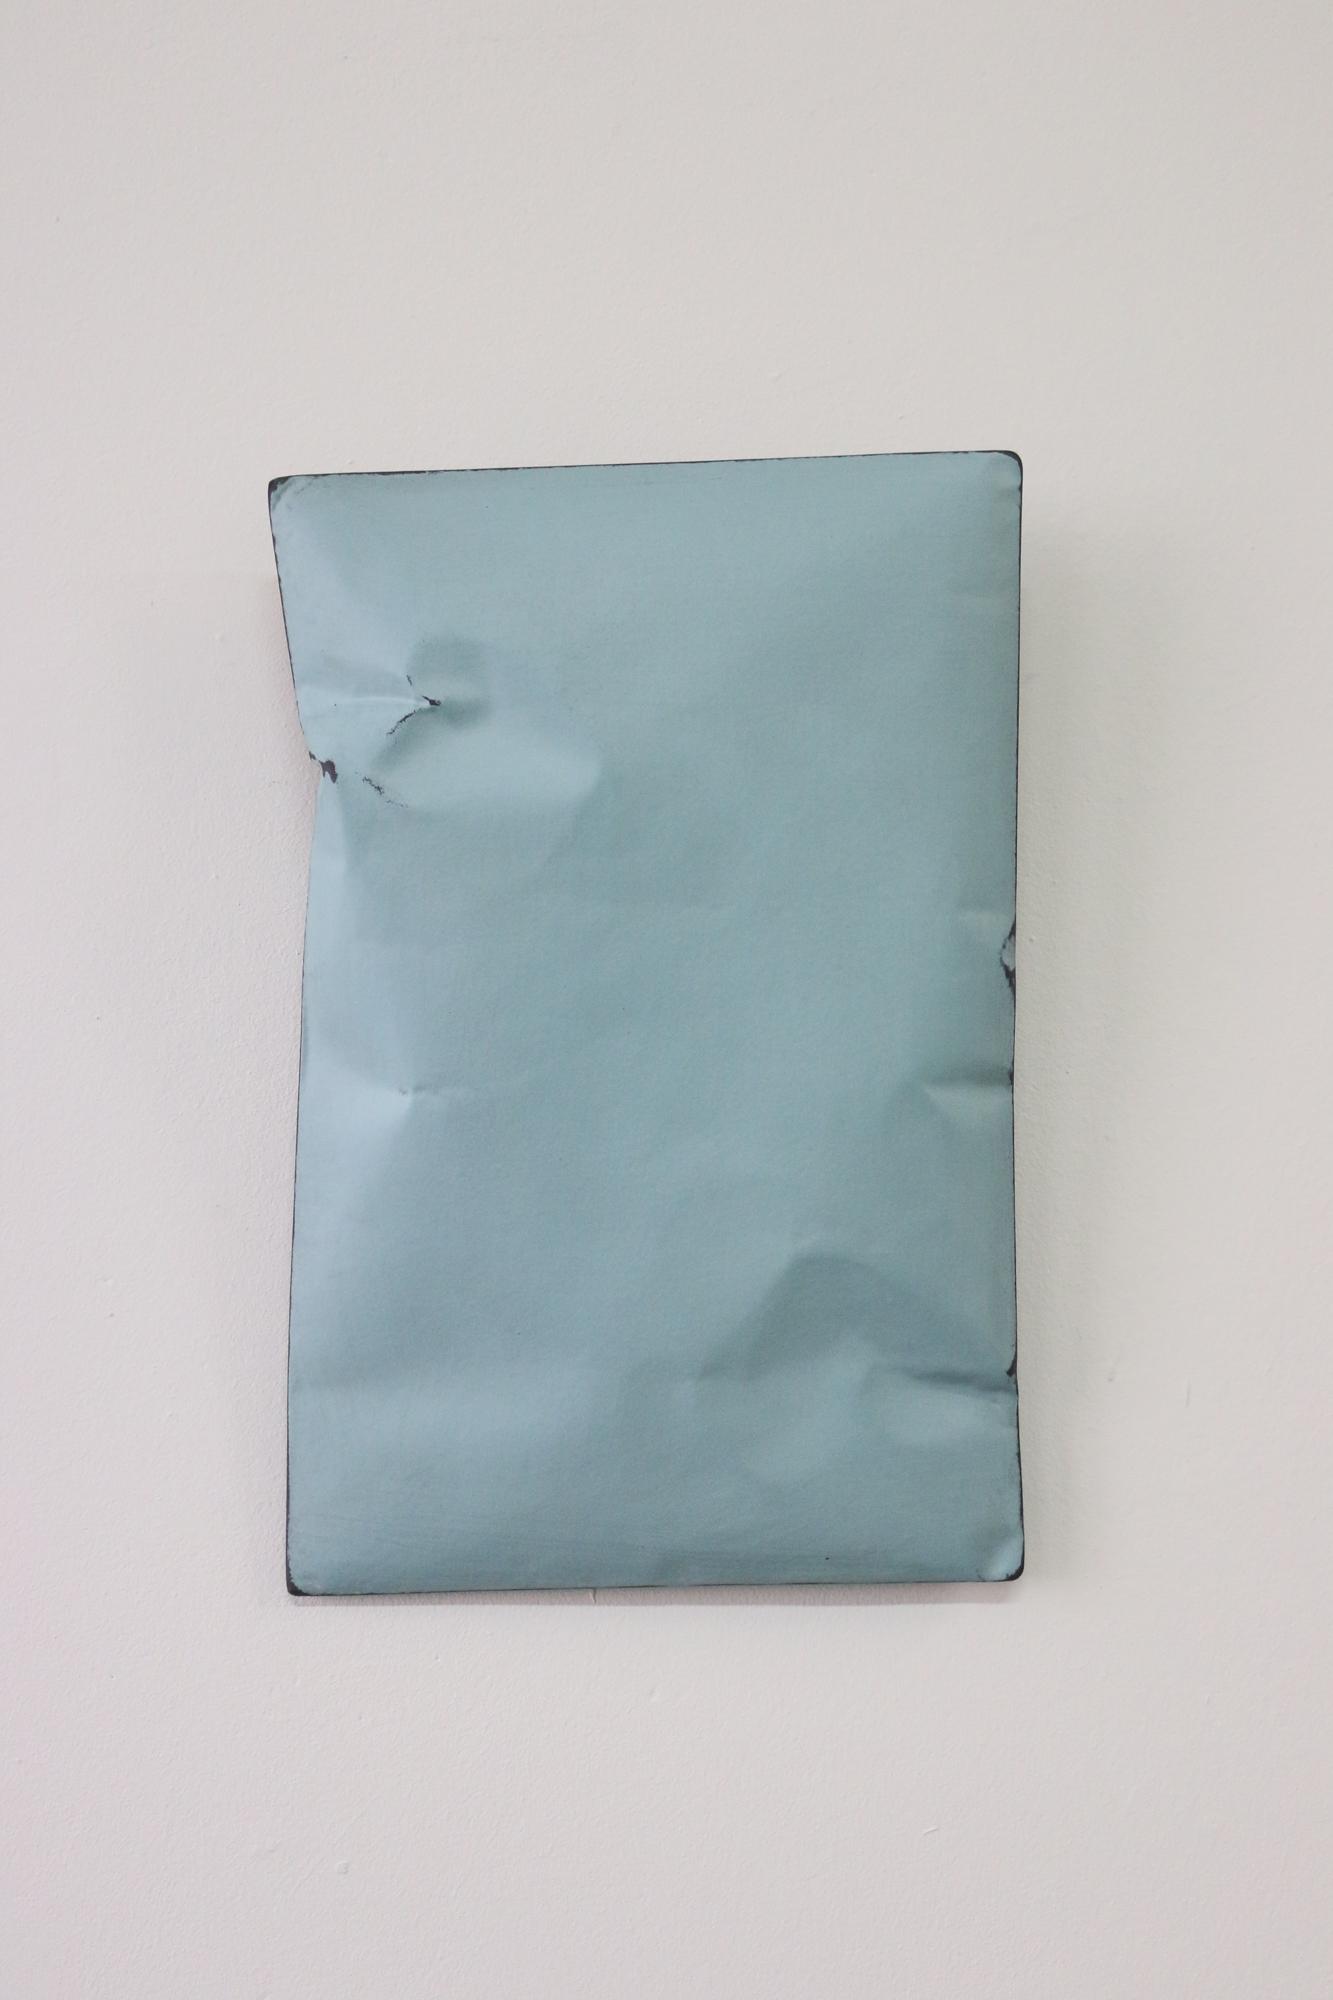 Johan De Wit, Untitled, 2018, Paper, Resin, Marble, Acrylic, 28 x 18.5 x 5 cm